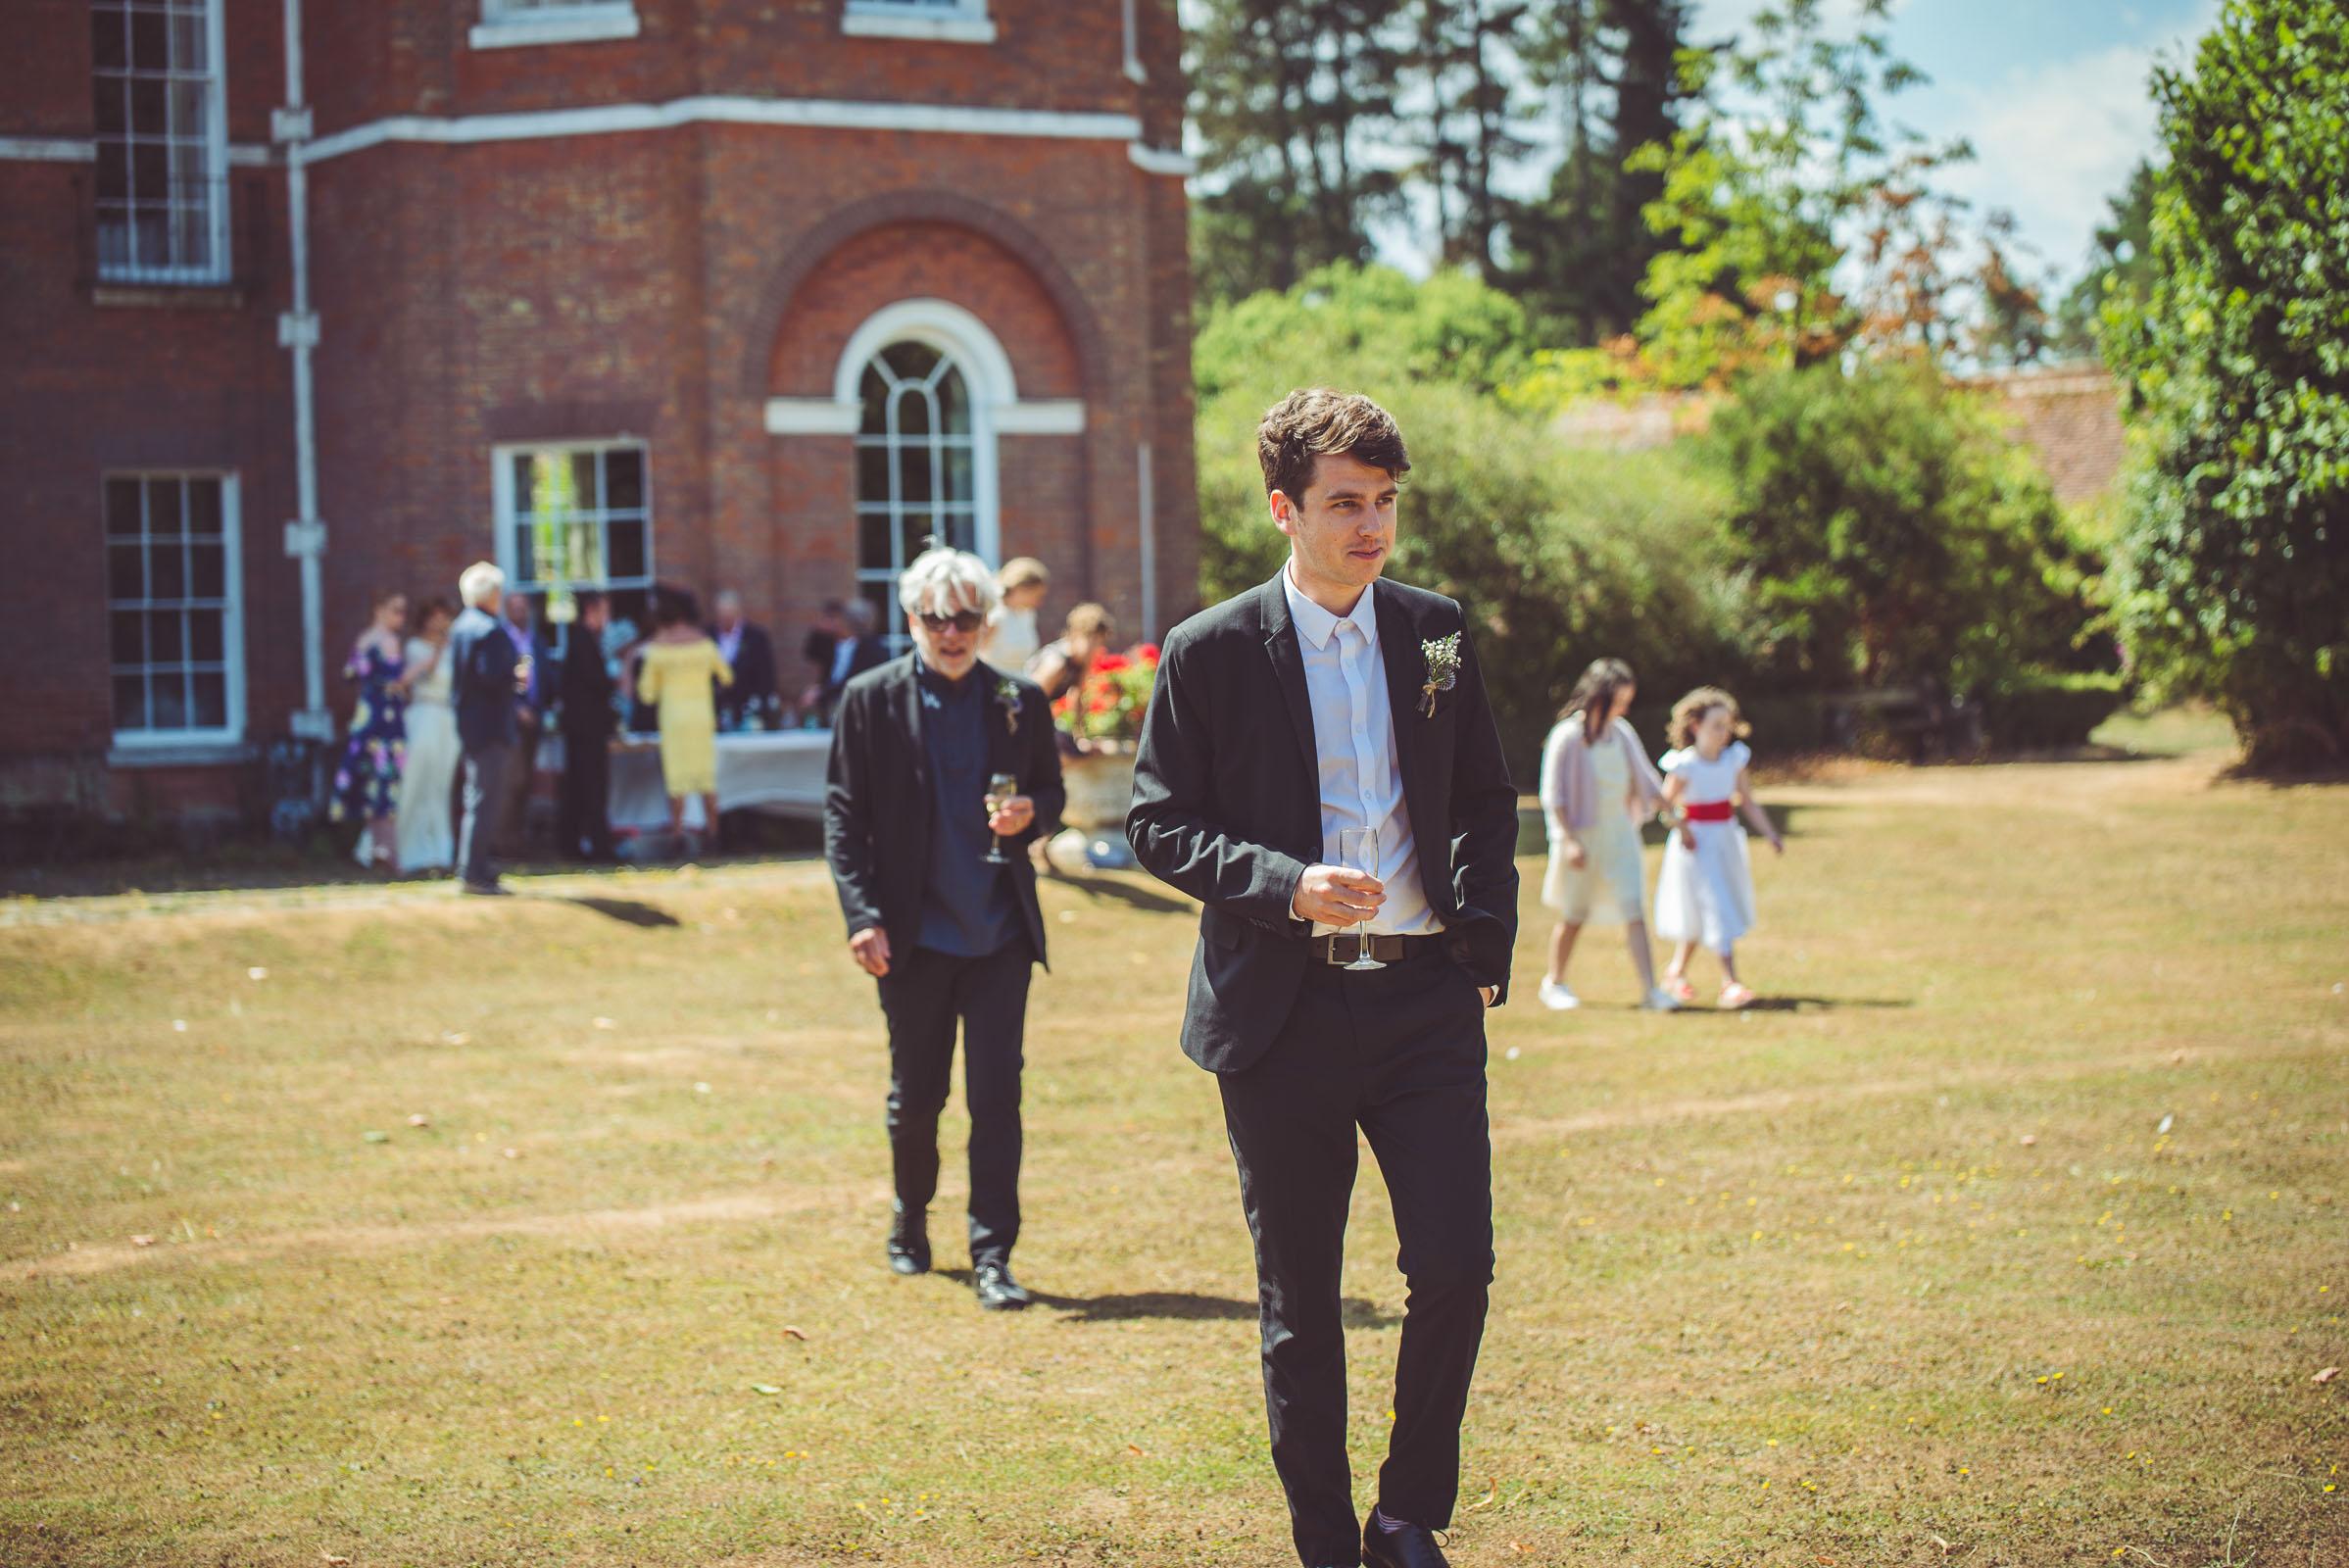 Hitchin_wedding_St_Pauls_Waldenbury_Royston_Wedding_Photographer-22.jpg